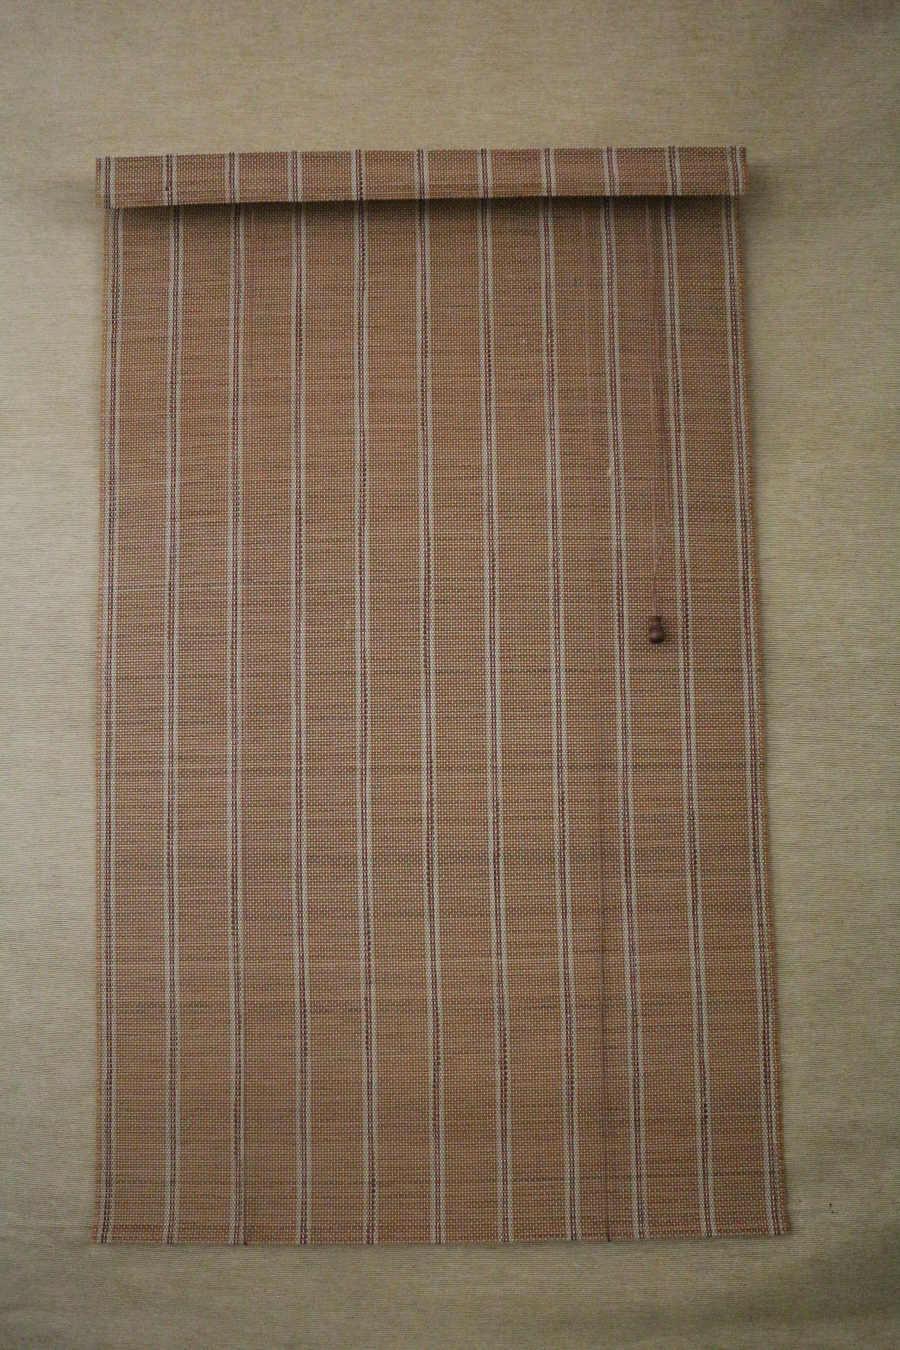 Popular Bamboo Blinds Bamboo Roller Blinds Ready Made Curtain Curtain Fabric Curtain Window Curtain